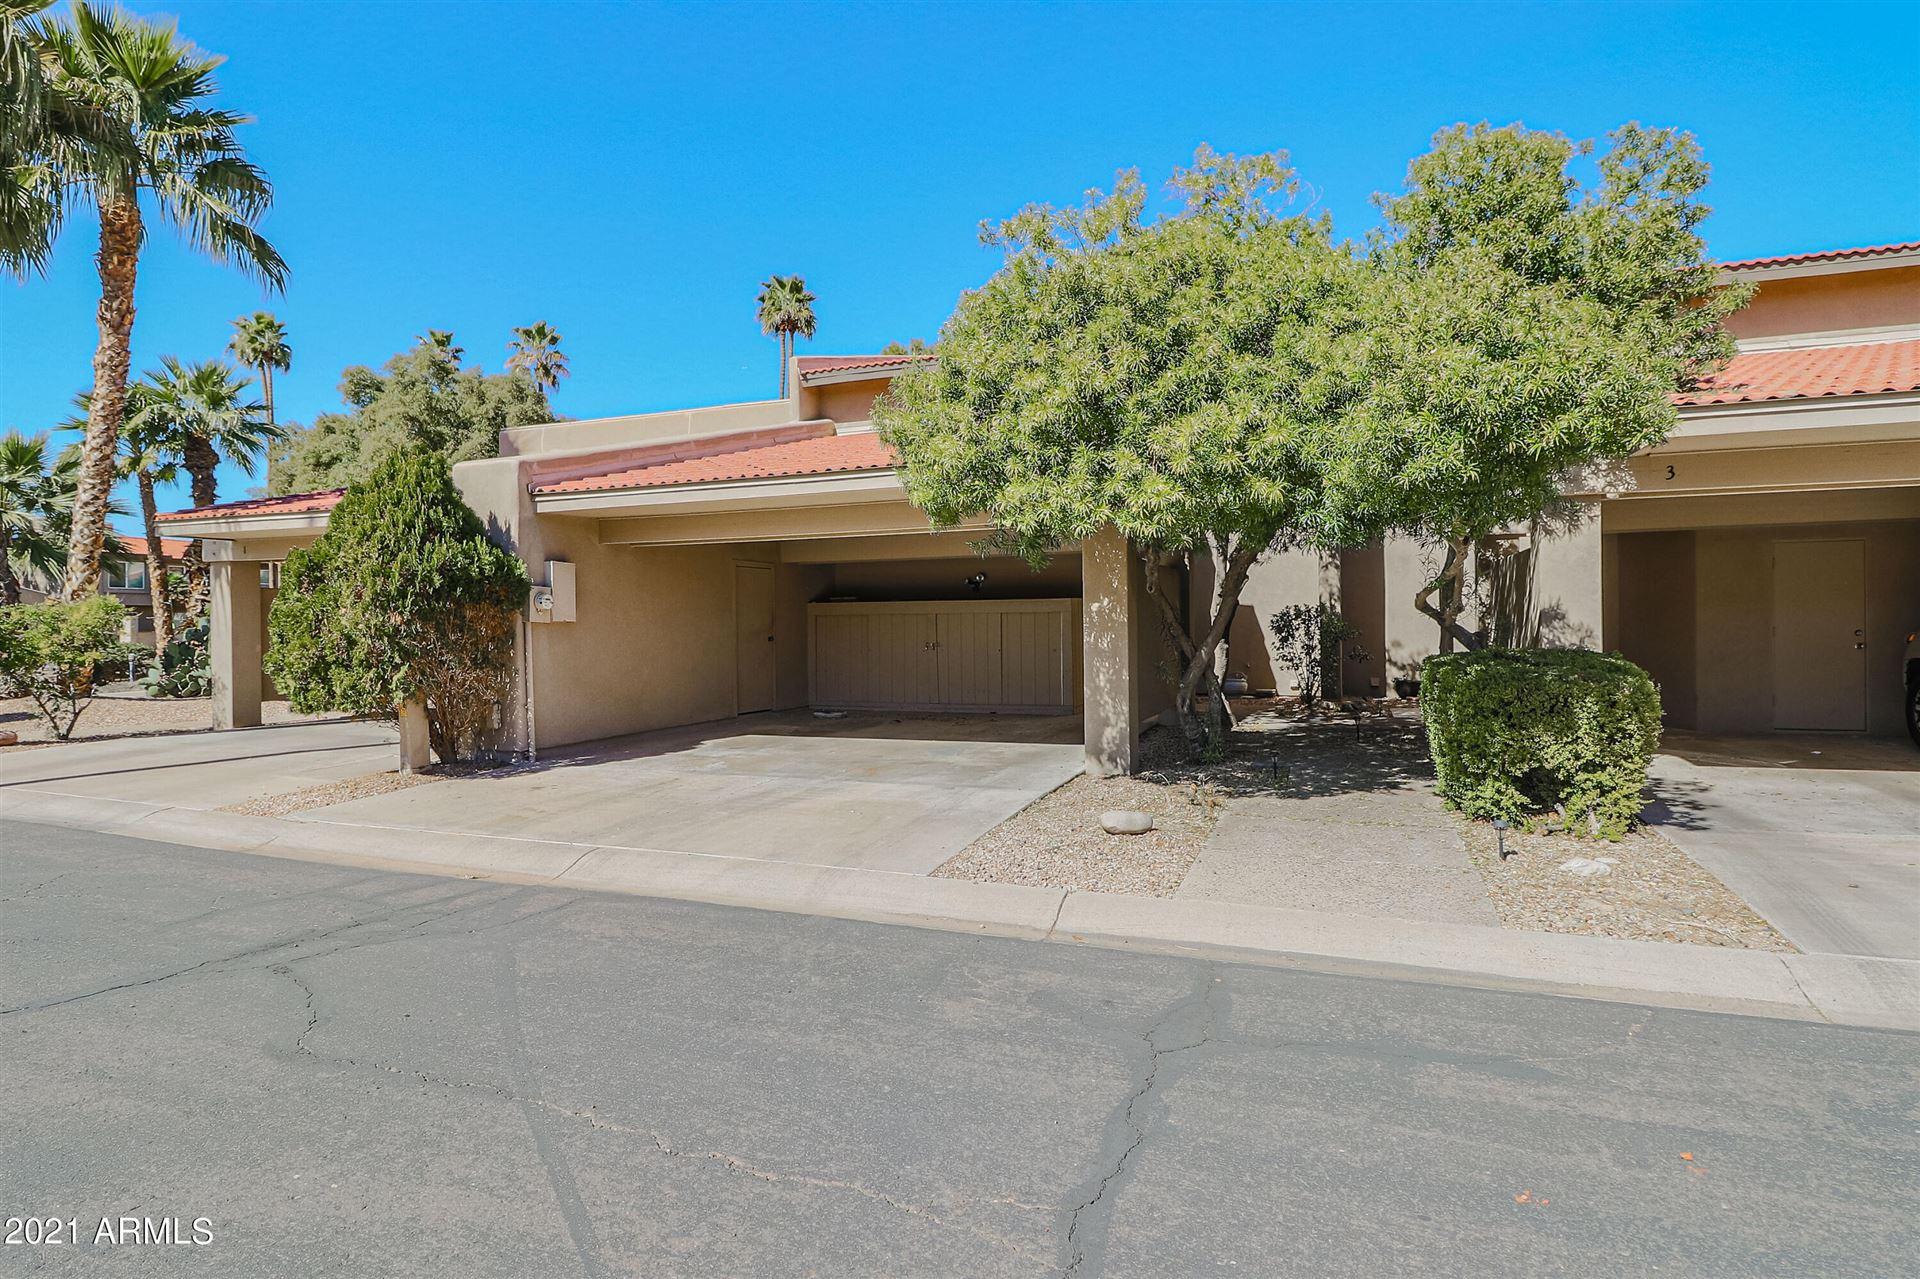 Photo for 5634 N 79TH Way #2, Scottsdale, AZ 85250 (MLS # 6197972)